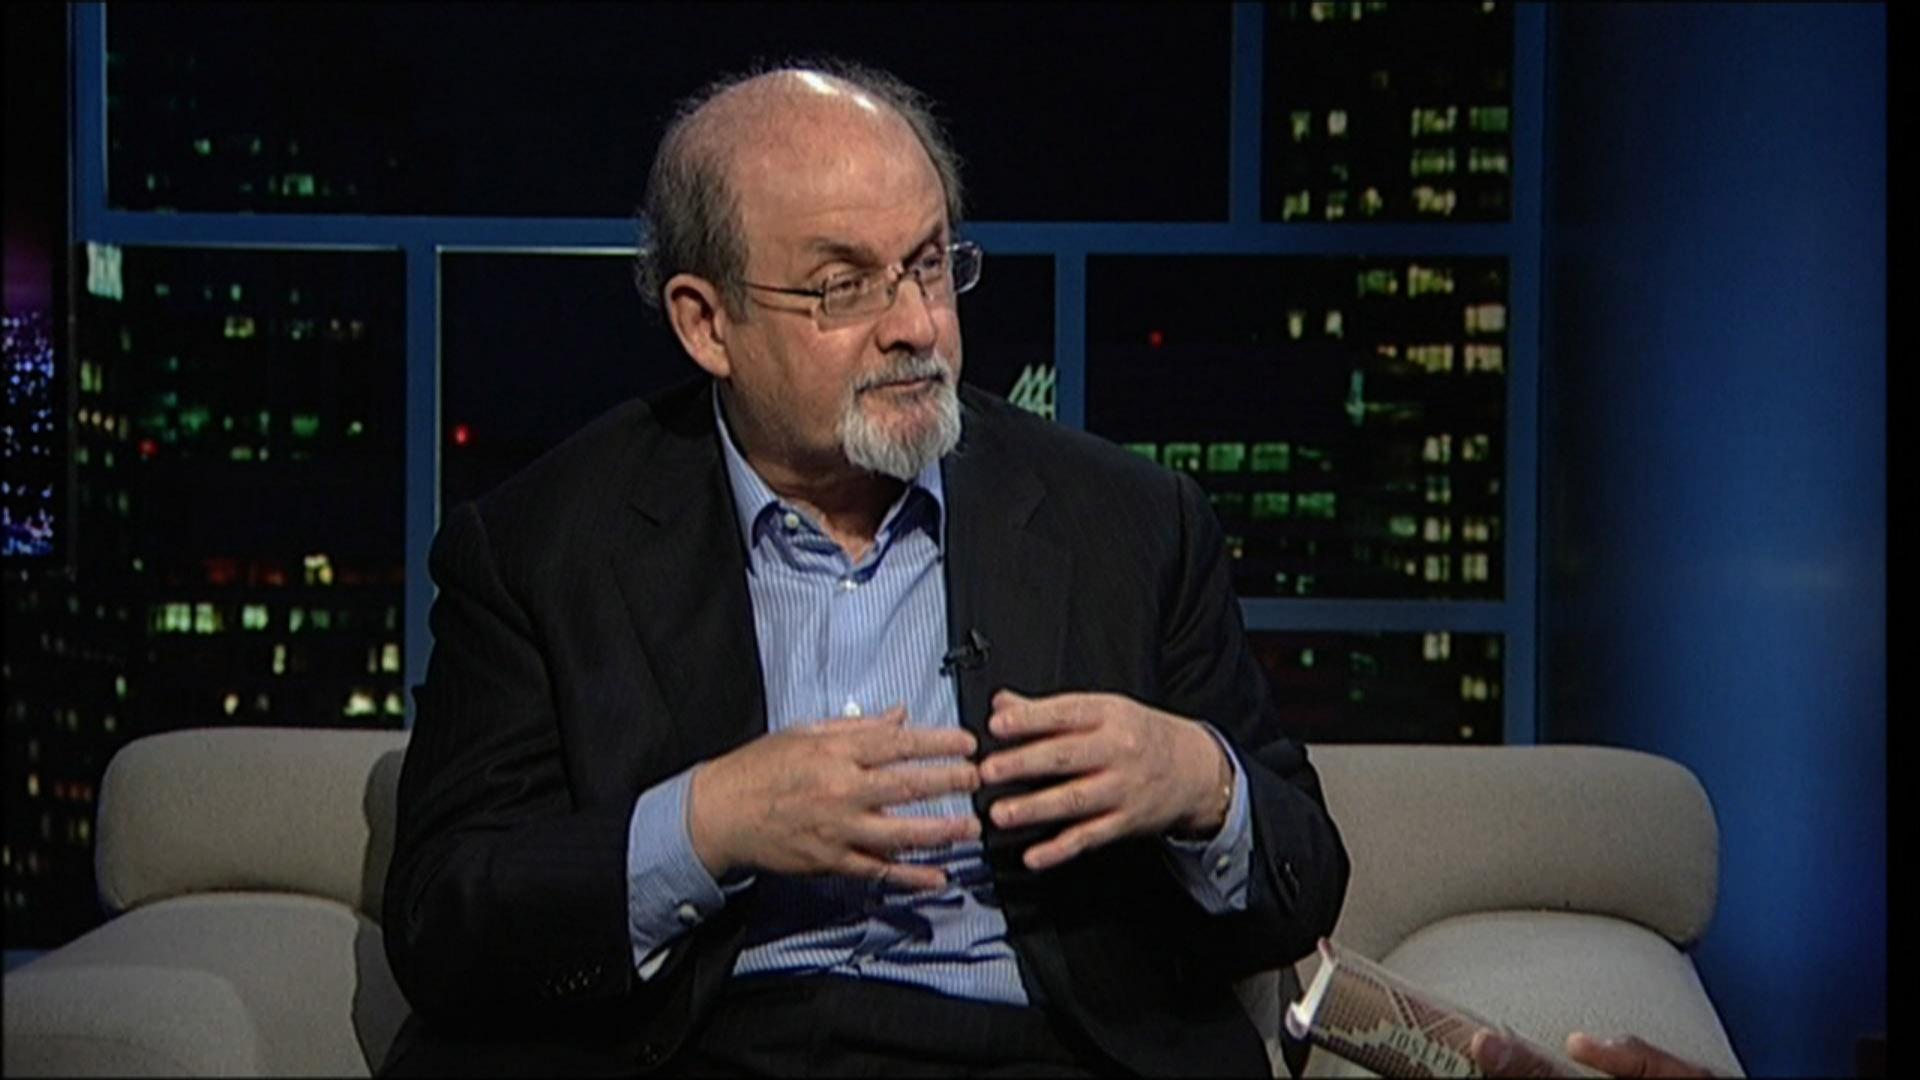 Author Salman Rushdie image